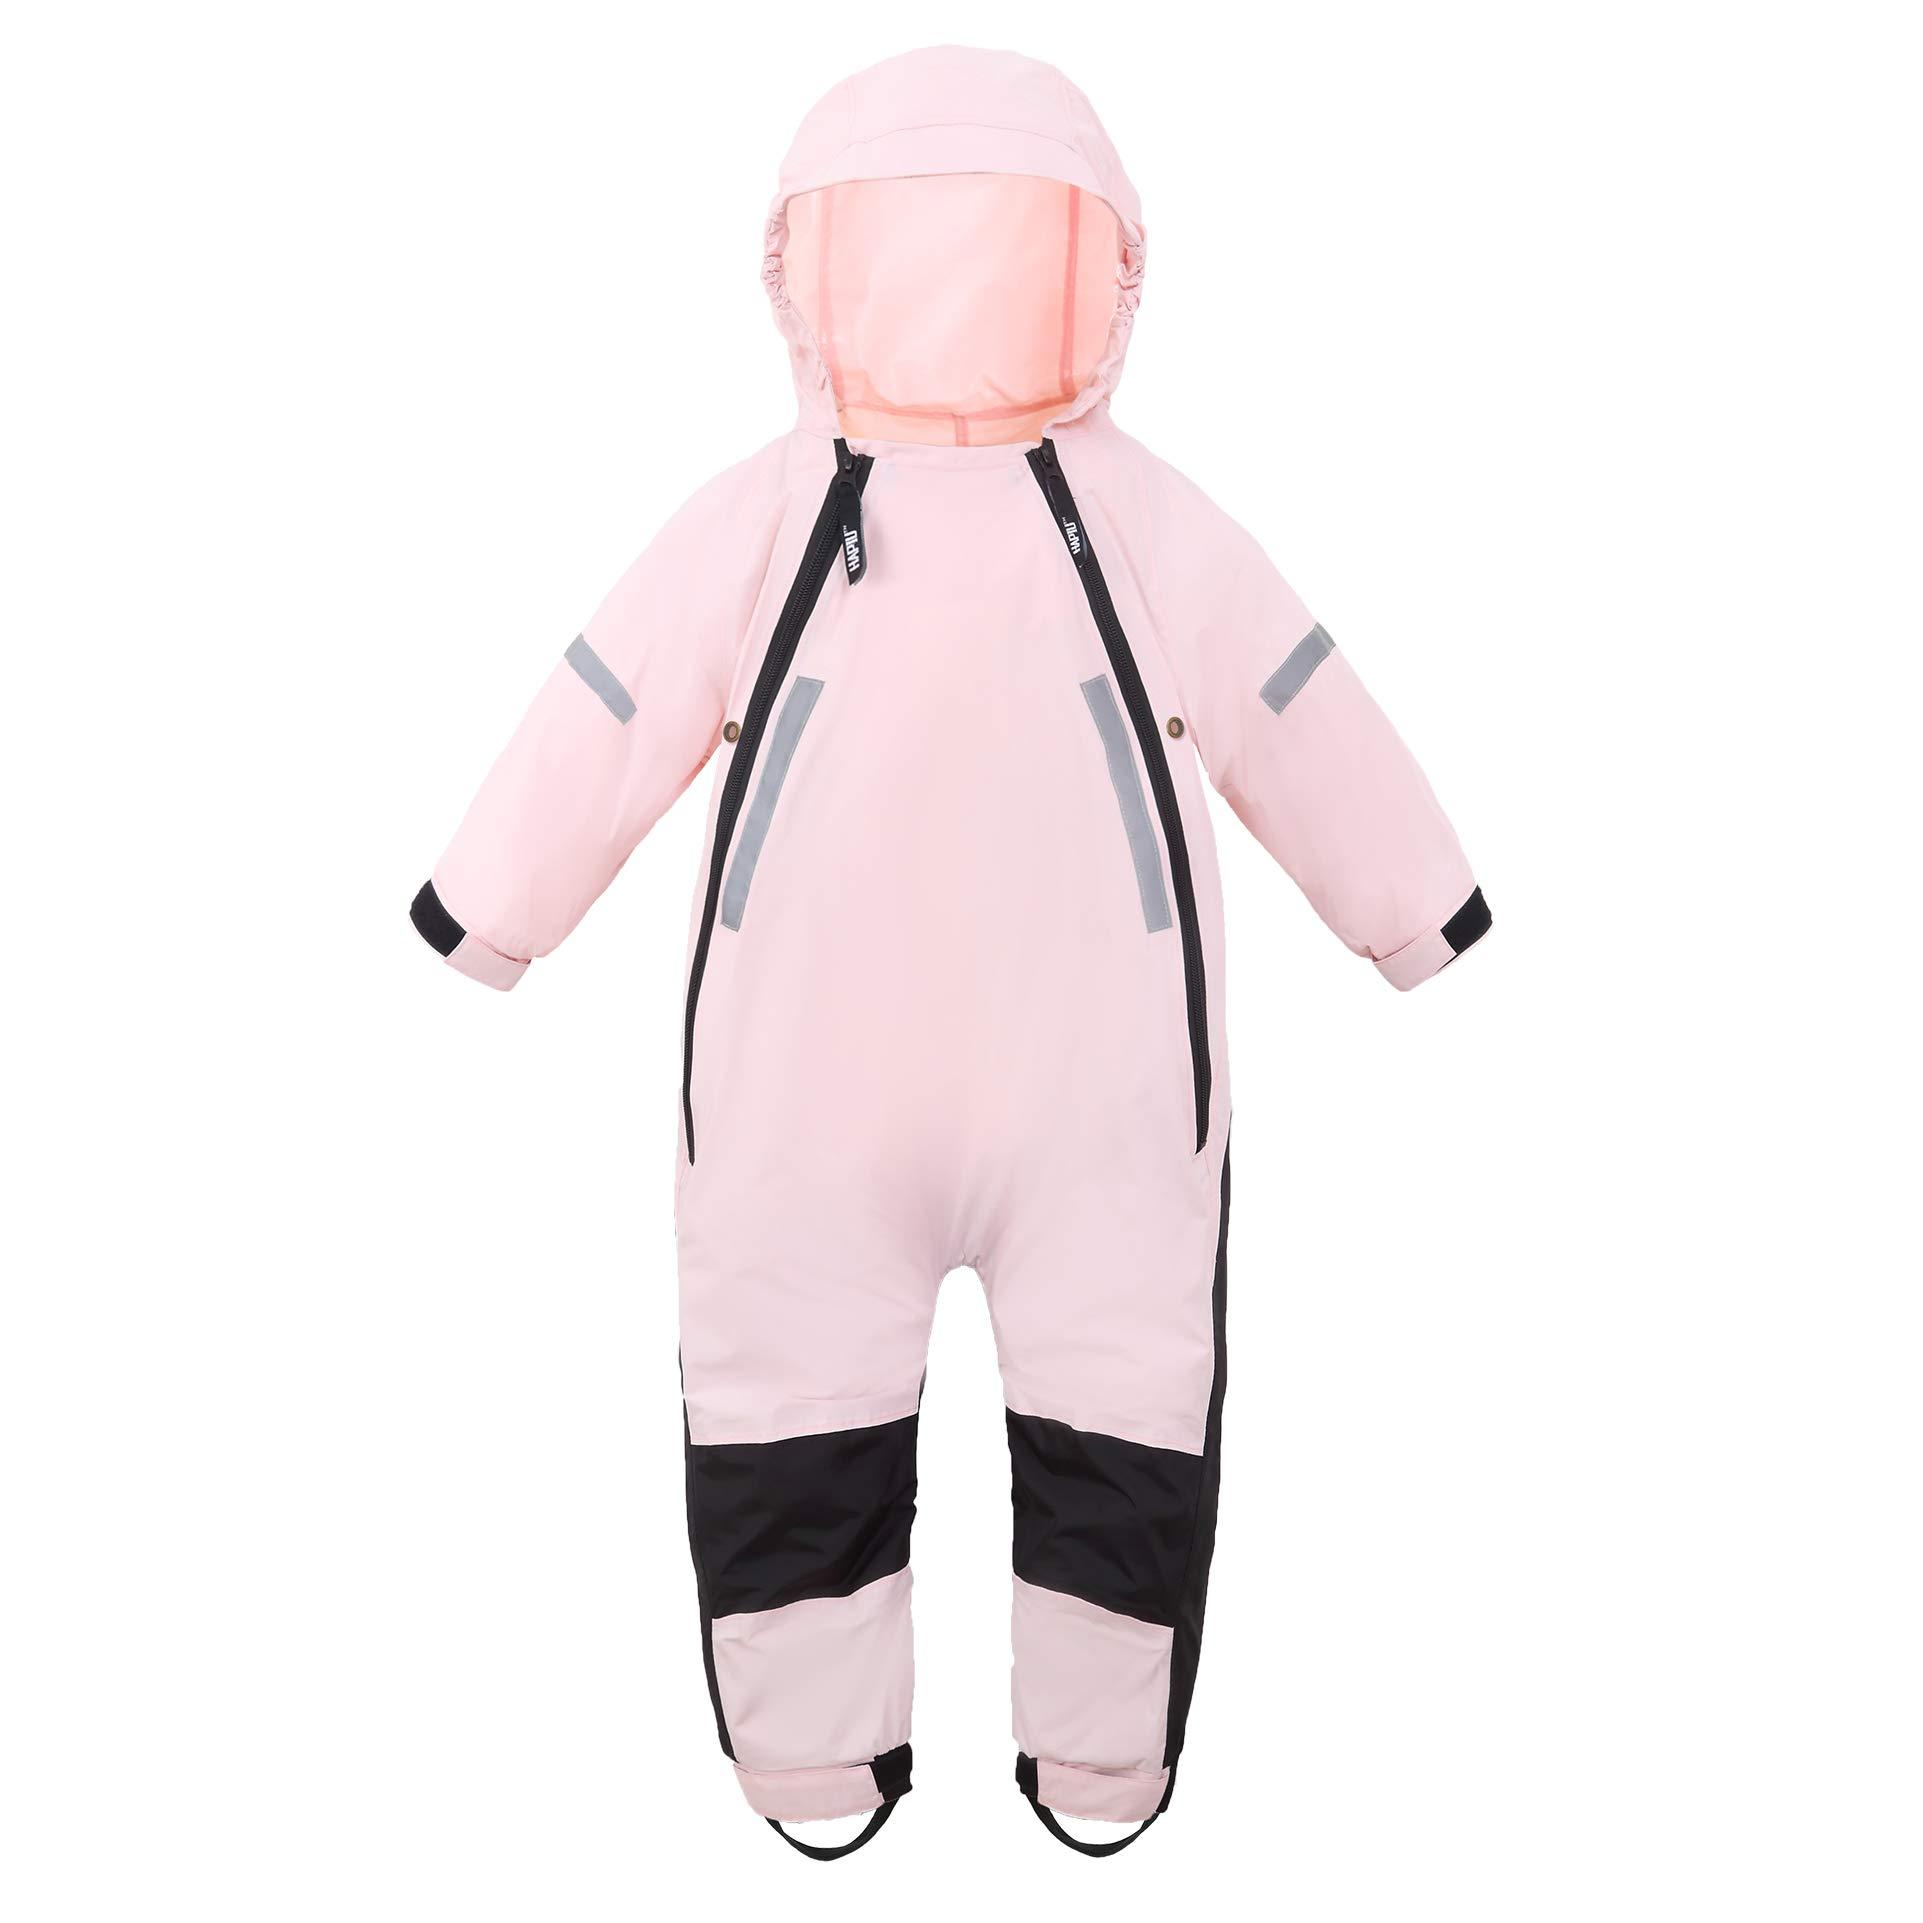 HAPIU Kids Toddler Rain Suit Muddy Buddy Waterproof Coverall,Pink,12M,Upgraded